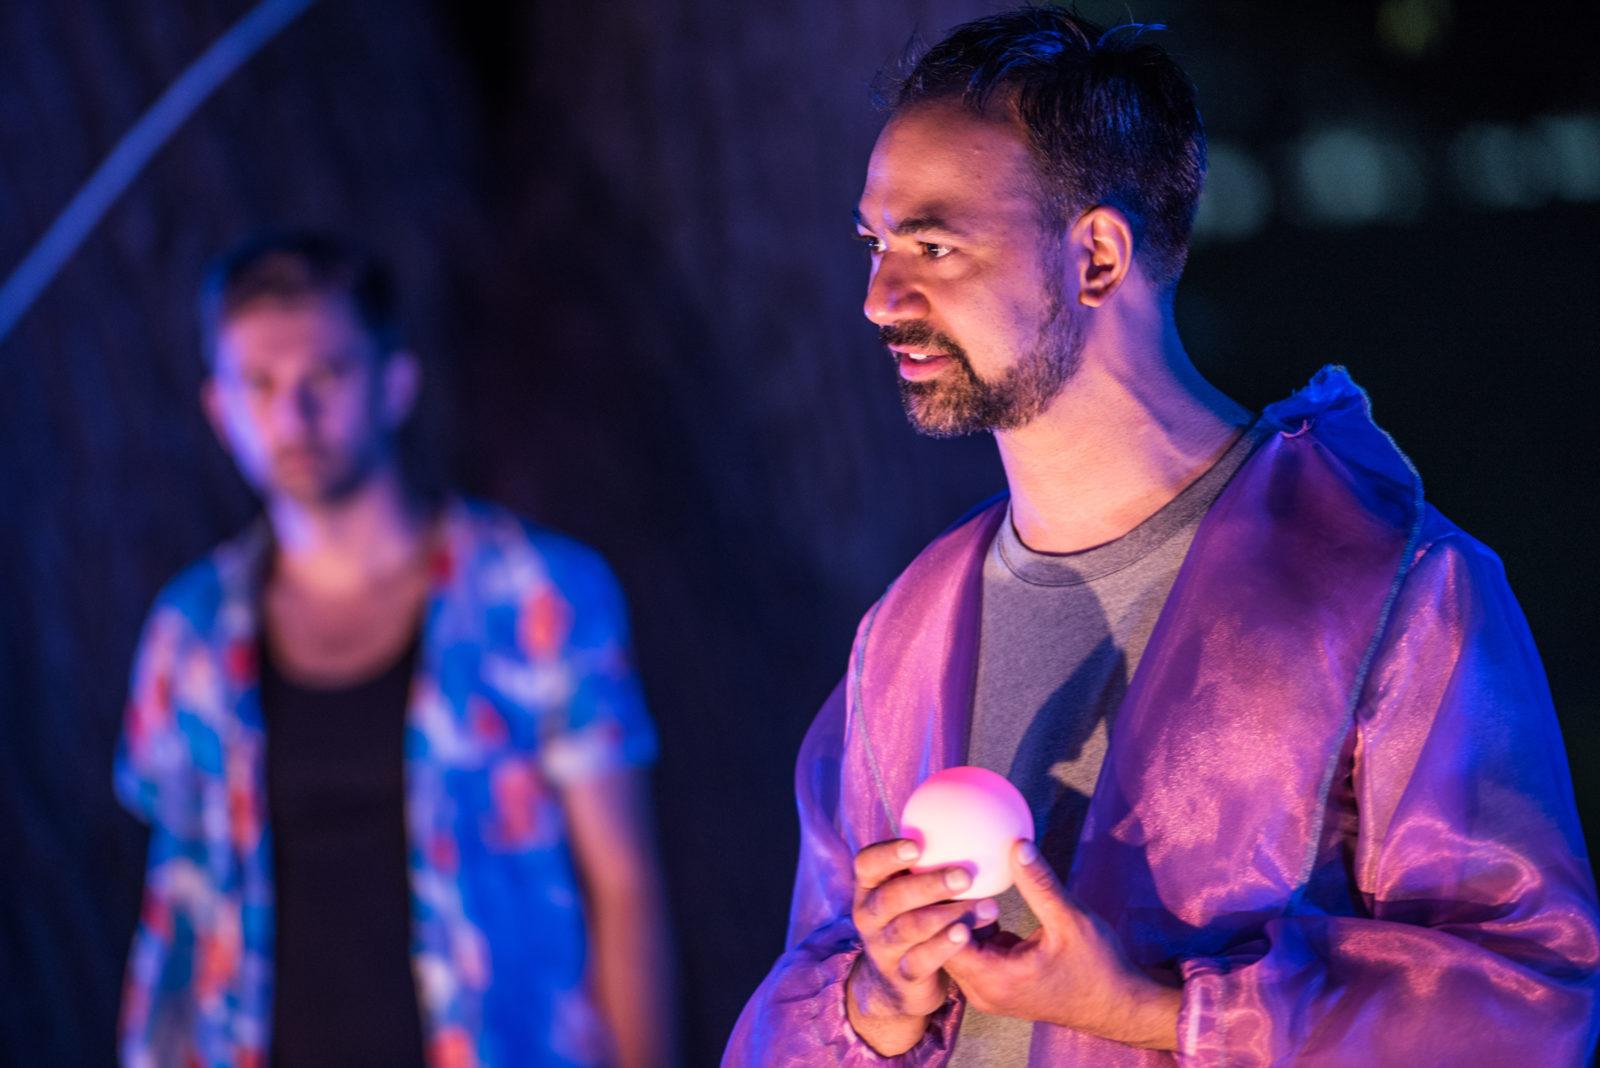 Shakespeare in the Ruff, A Midsummer Night's Dream